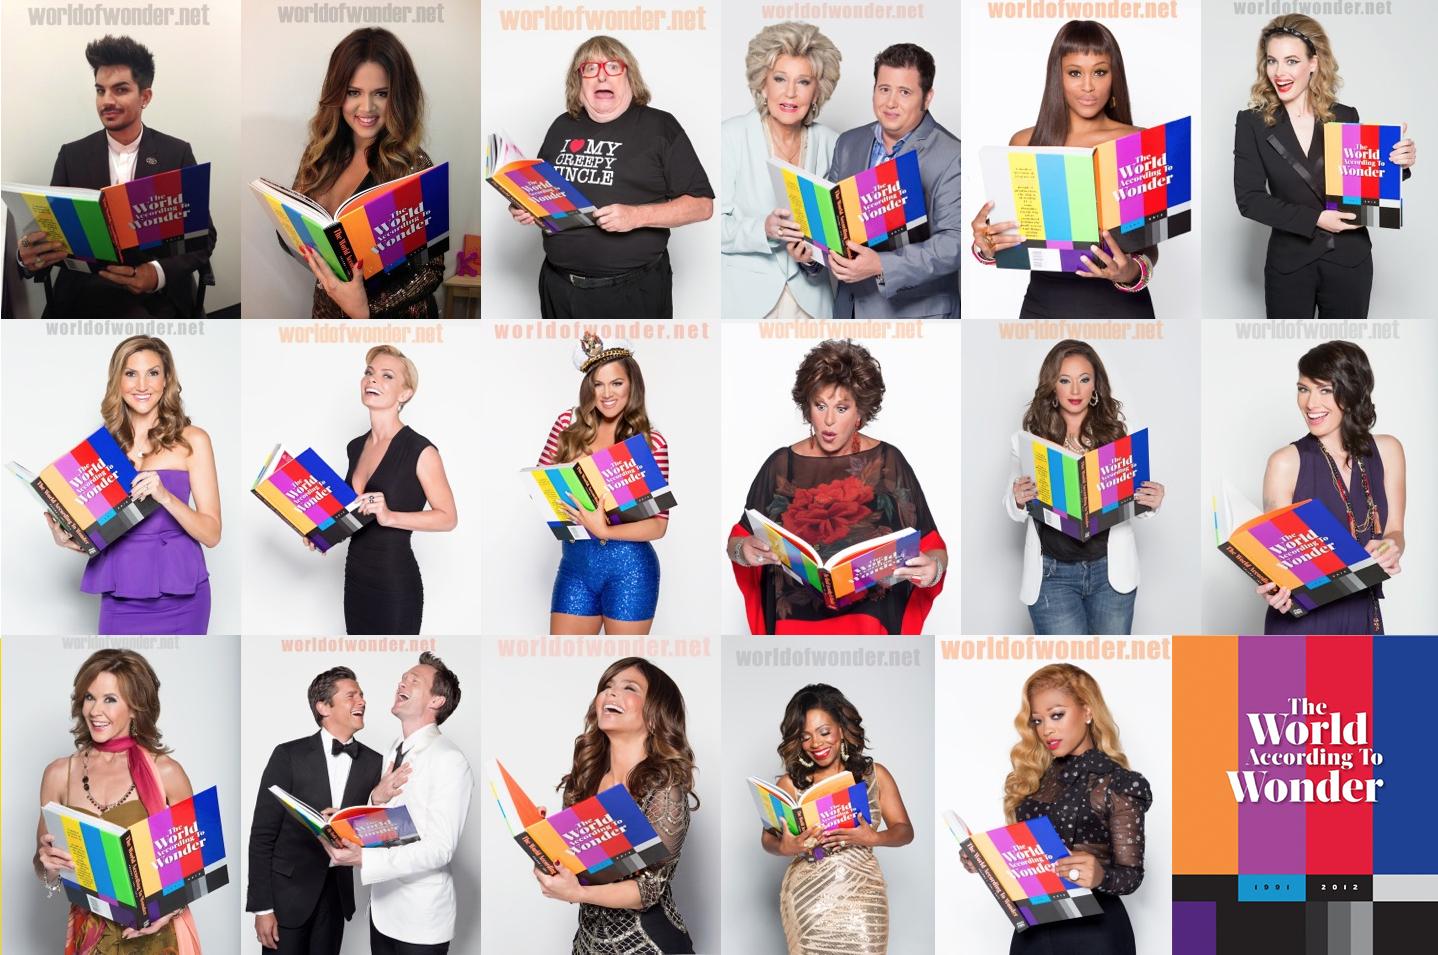 RuPauls-Drag-Race-Guest-Judges-World-According-to-Wonder